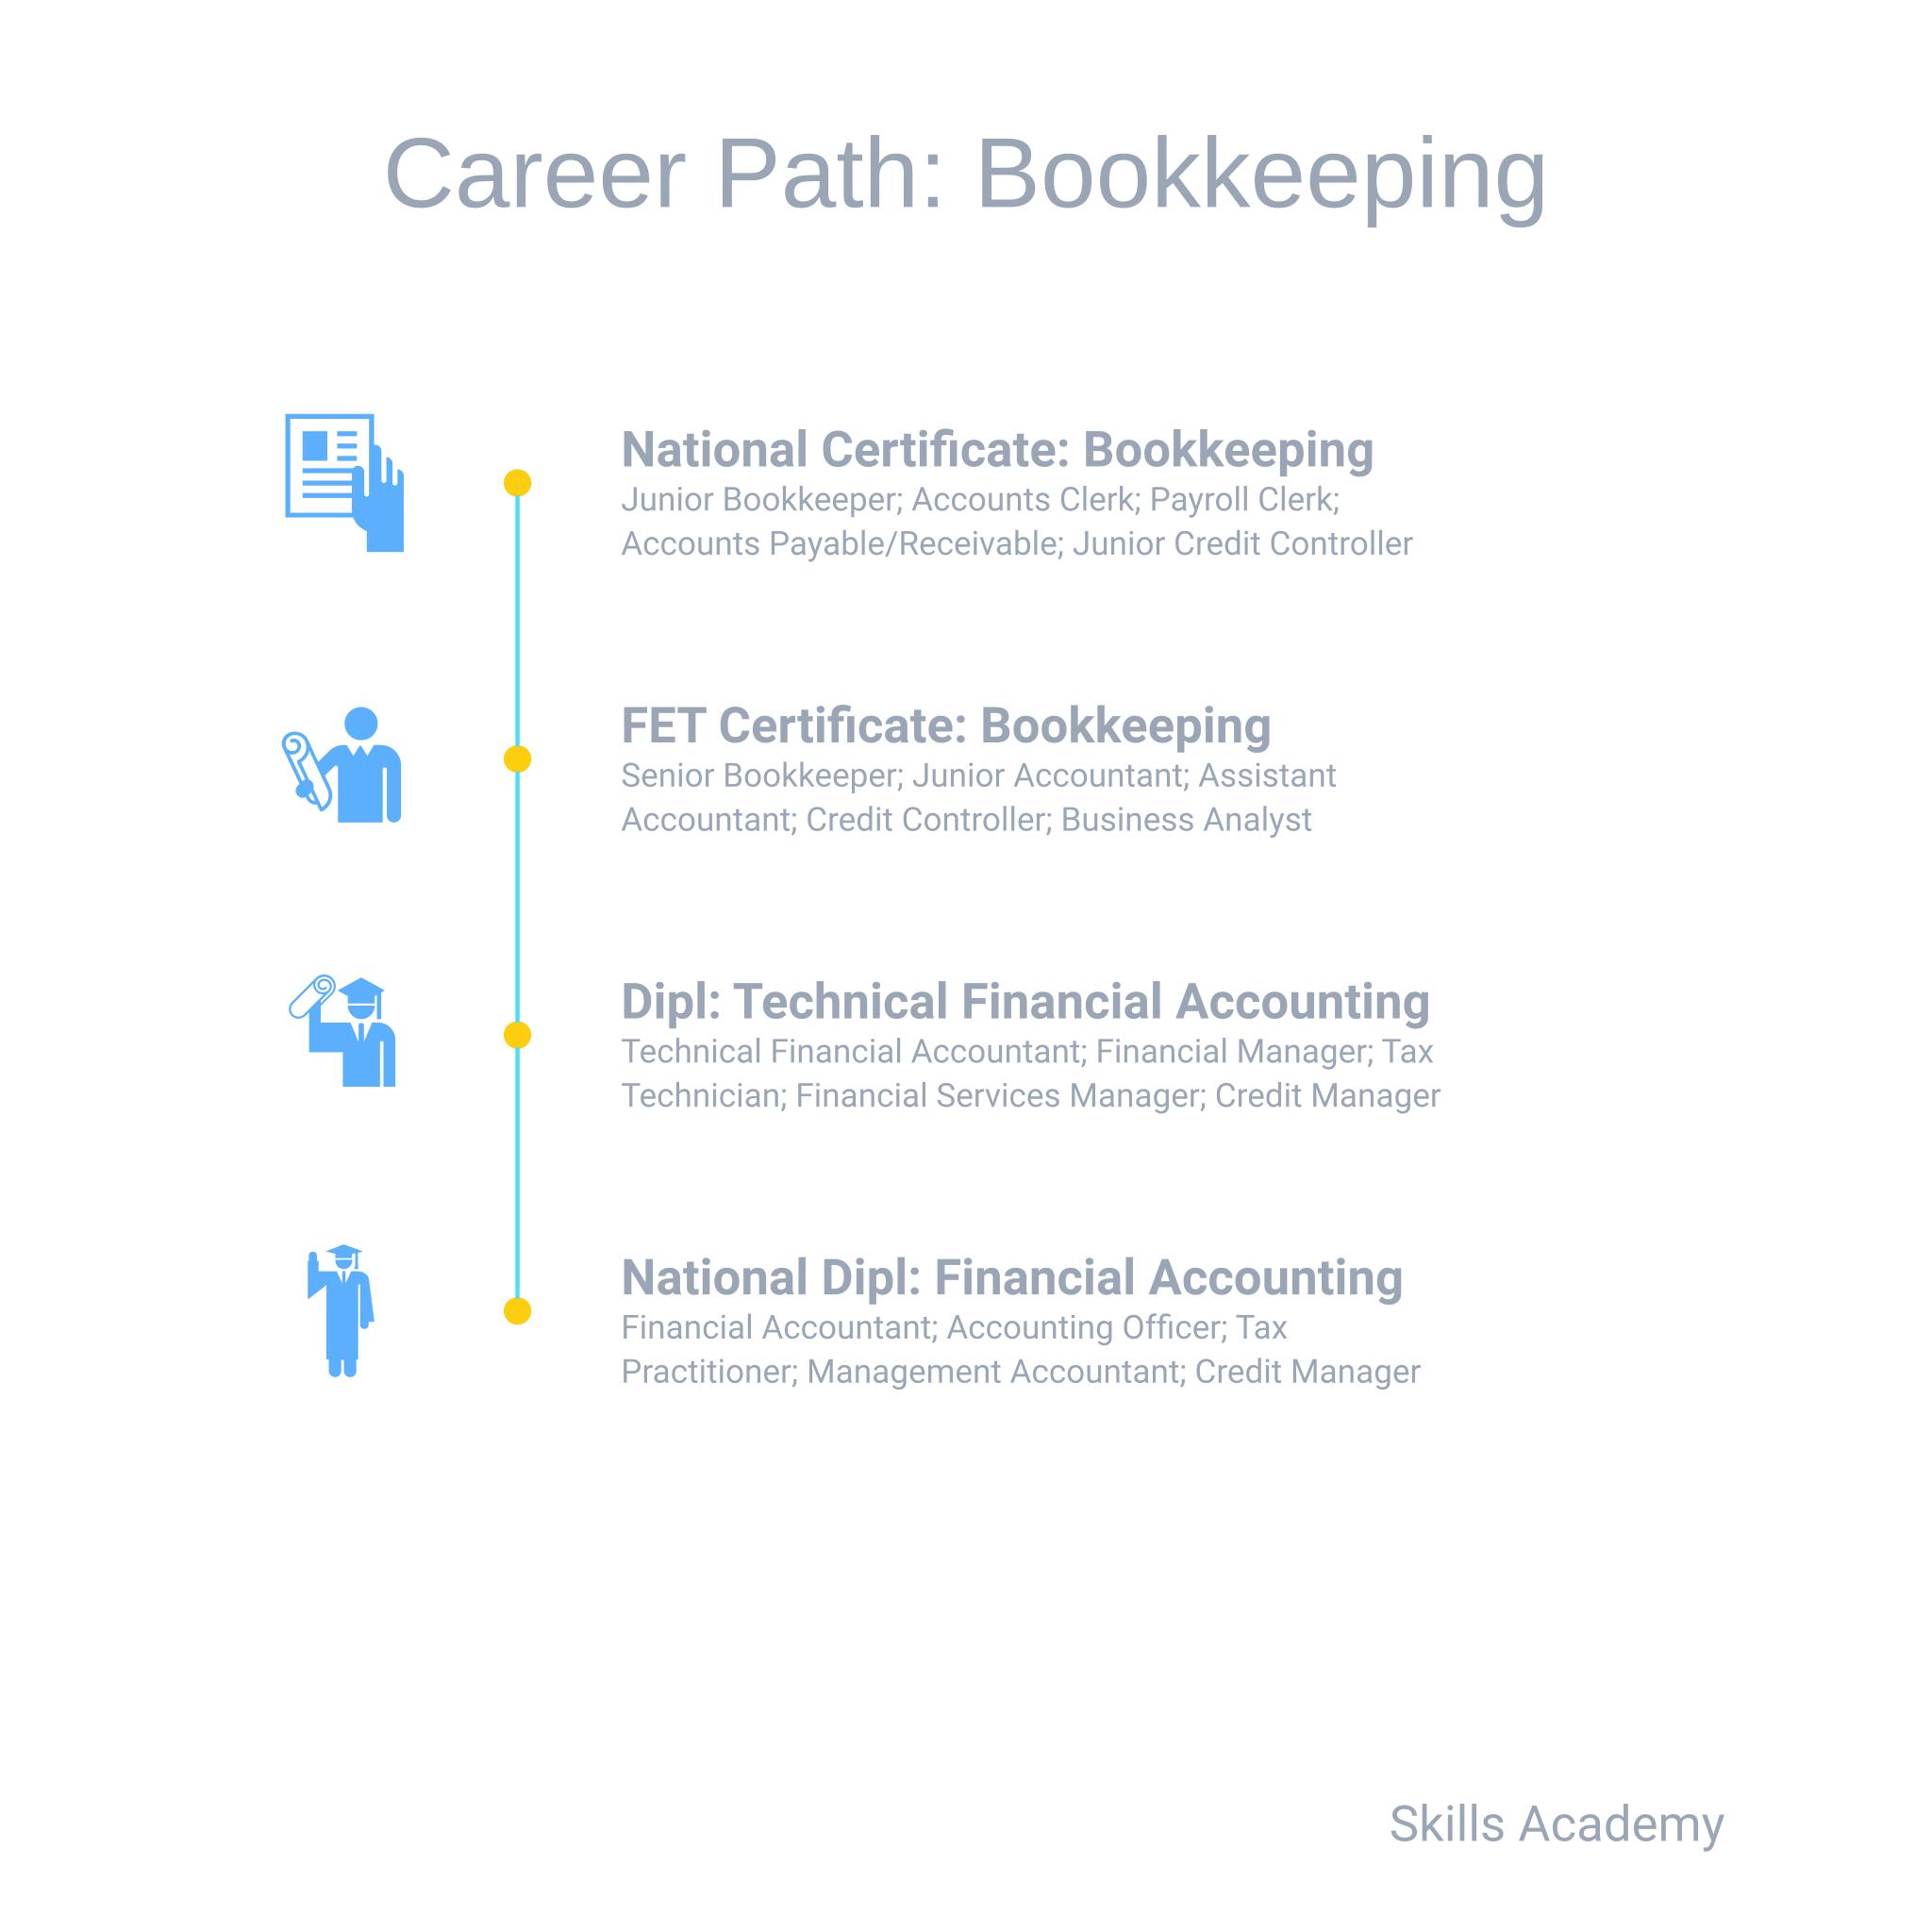 career-path-bookkeeping